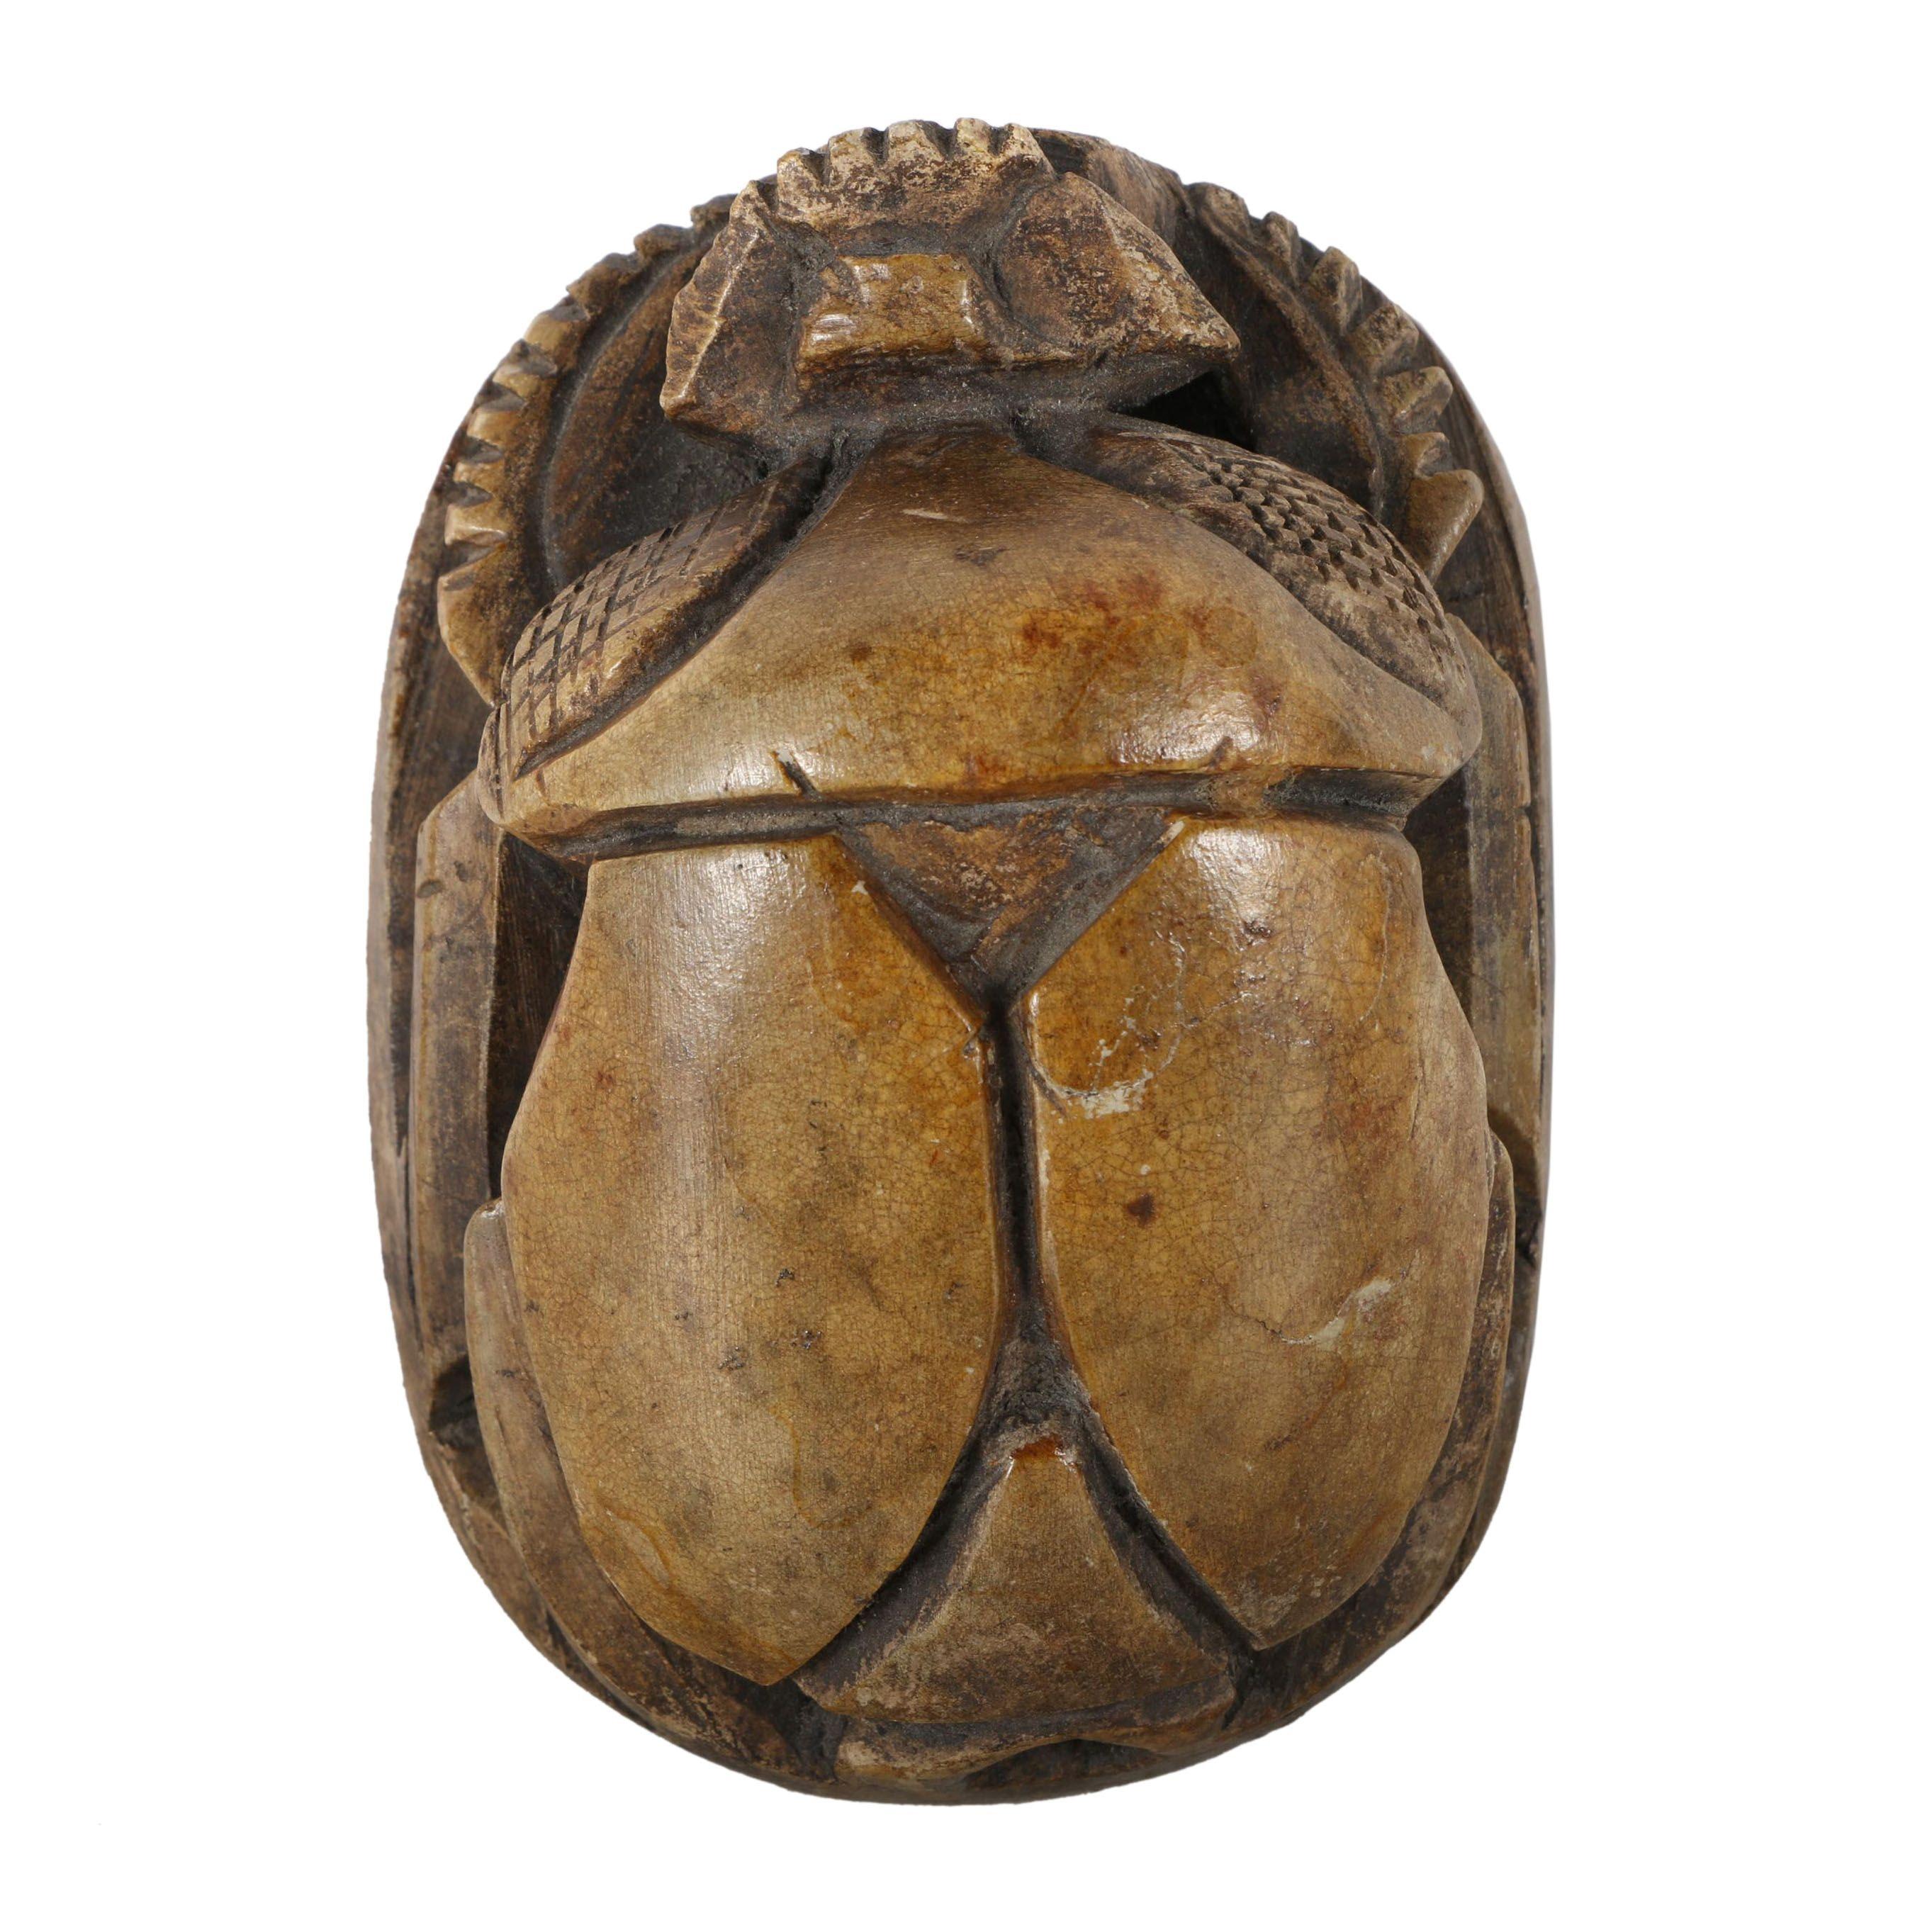 Egyptian Style Ceramic Scarab Beetle